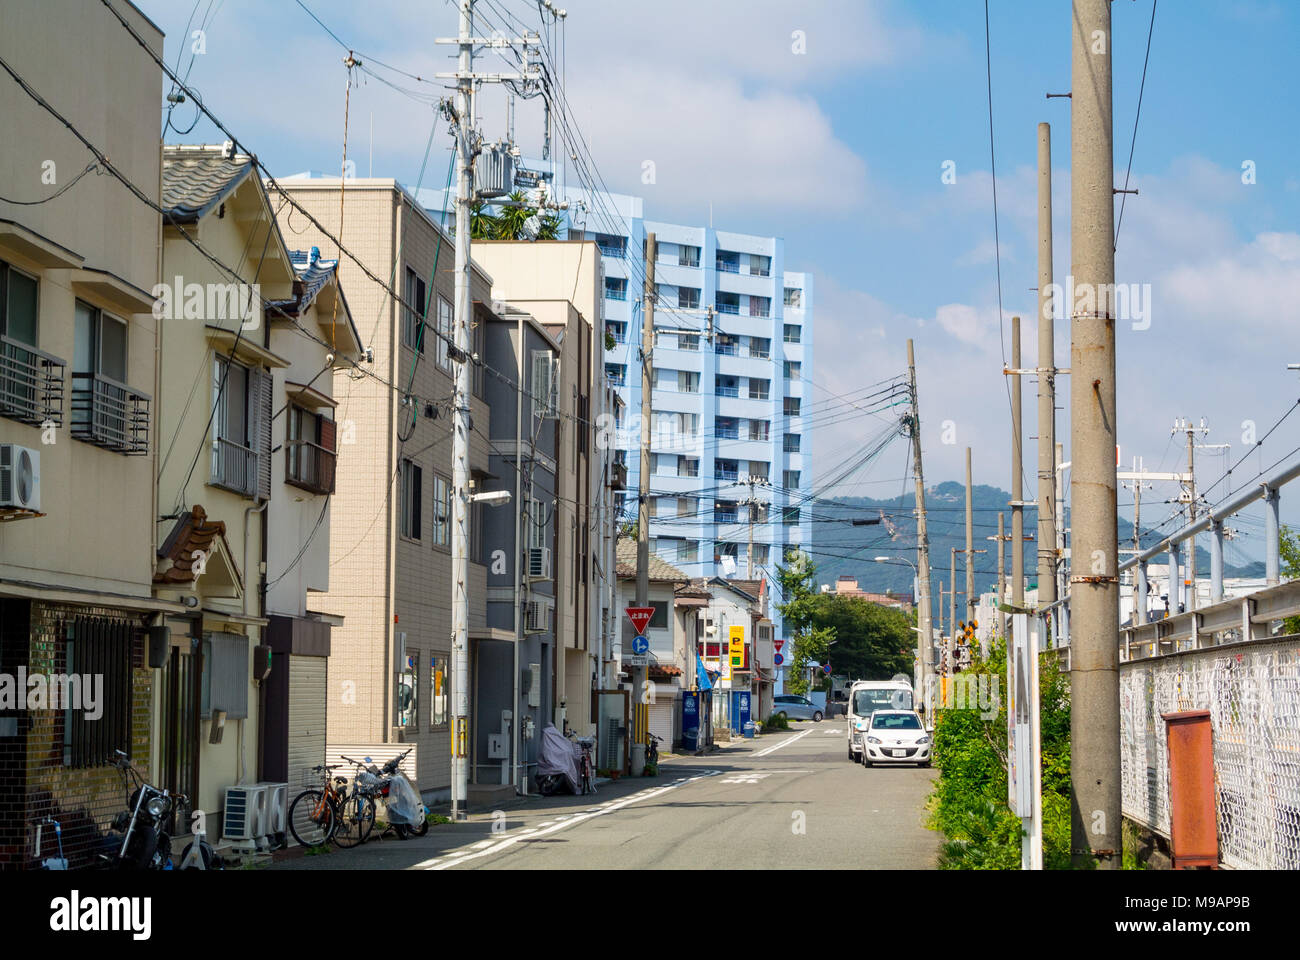 Street scene kobe hyogo prefecture japan stock photo 177872615 street scene kobe hyogo prefecture japan publicscrutiny Images